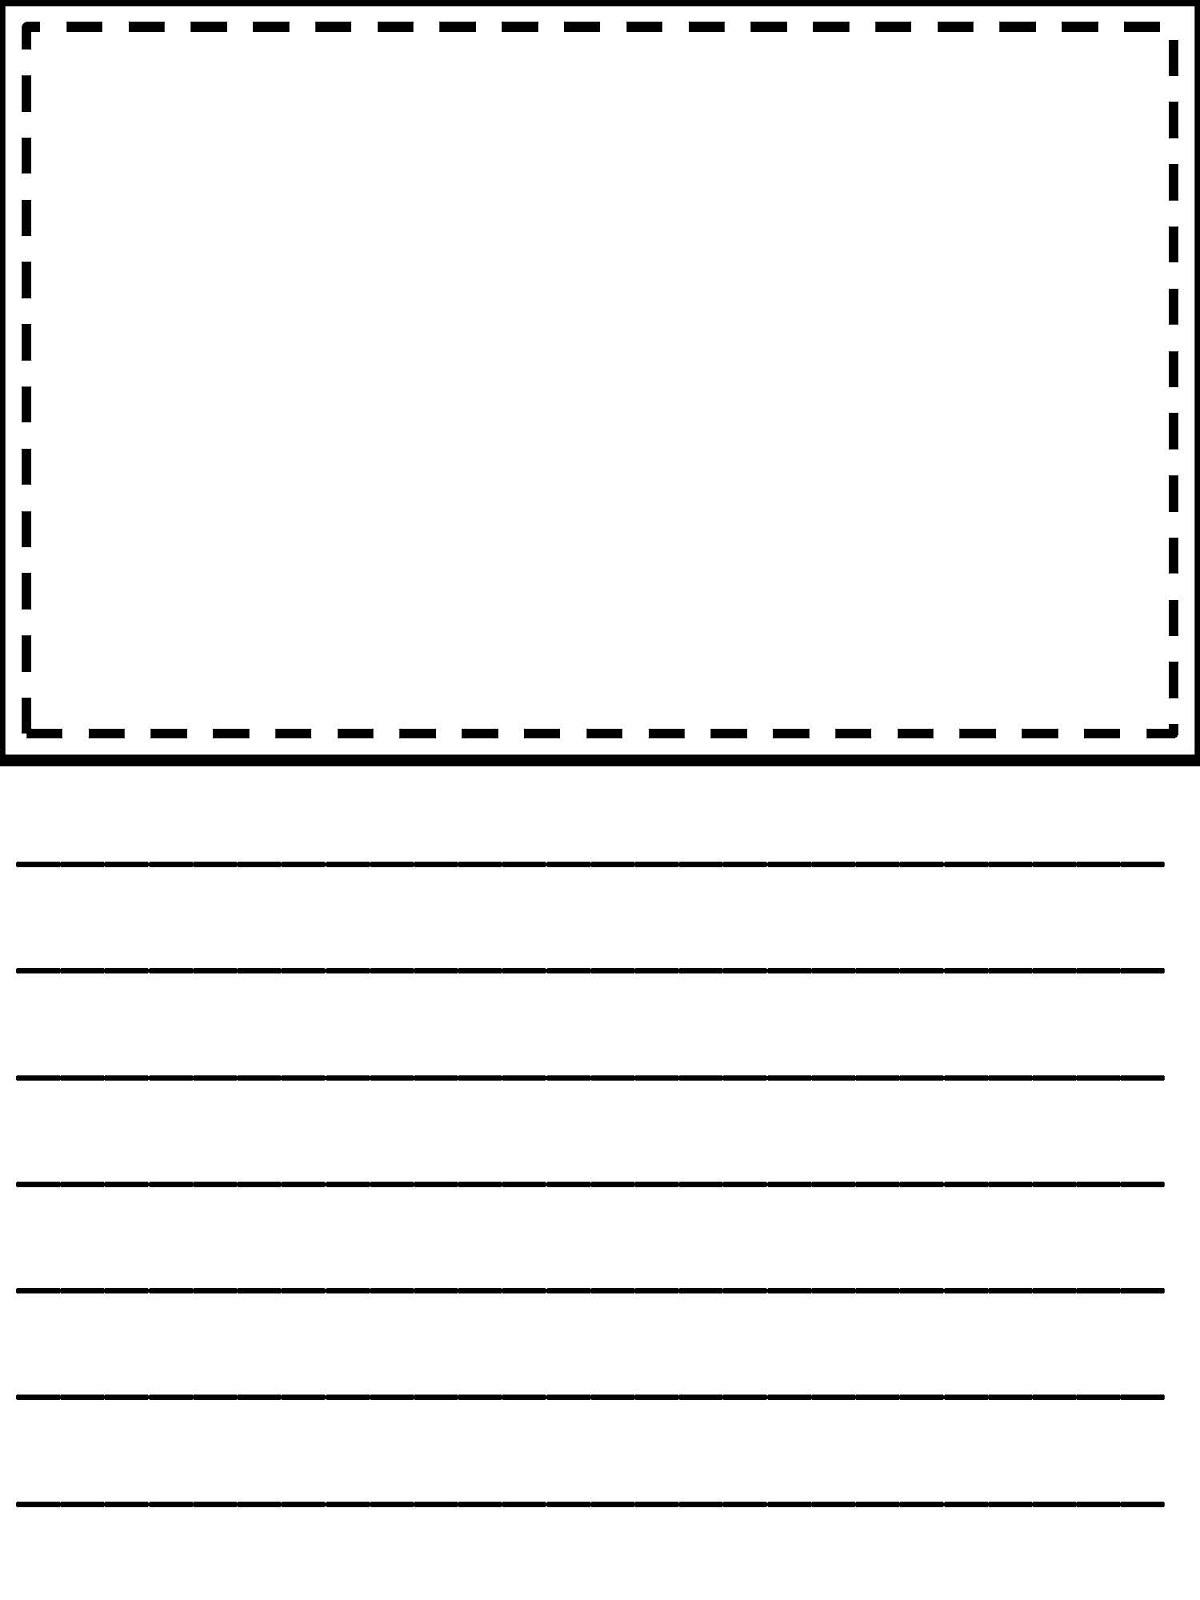 Third Grade Writing Paper | Homeshealth Handwriting Template - Free Printable Writing Paper